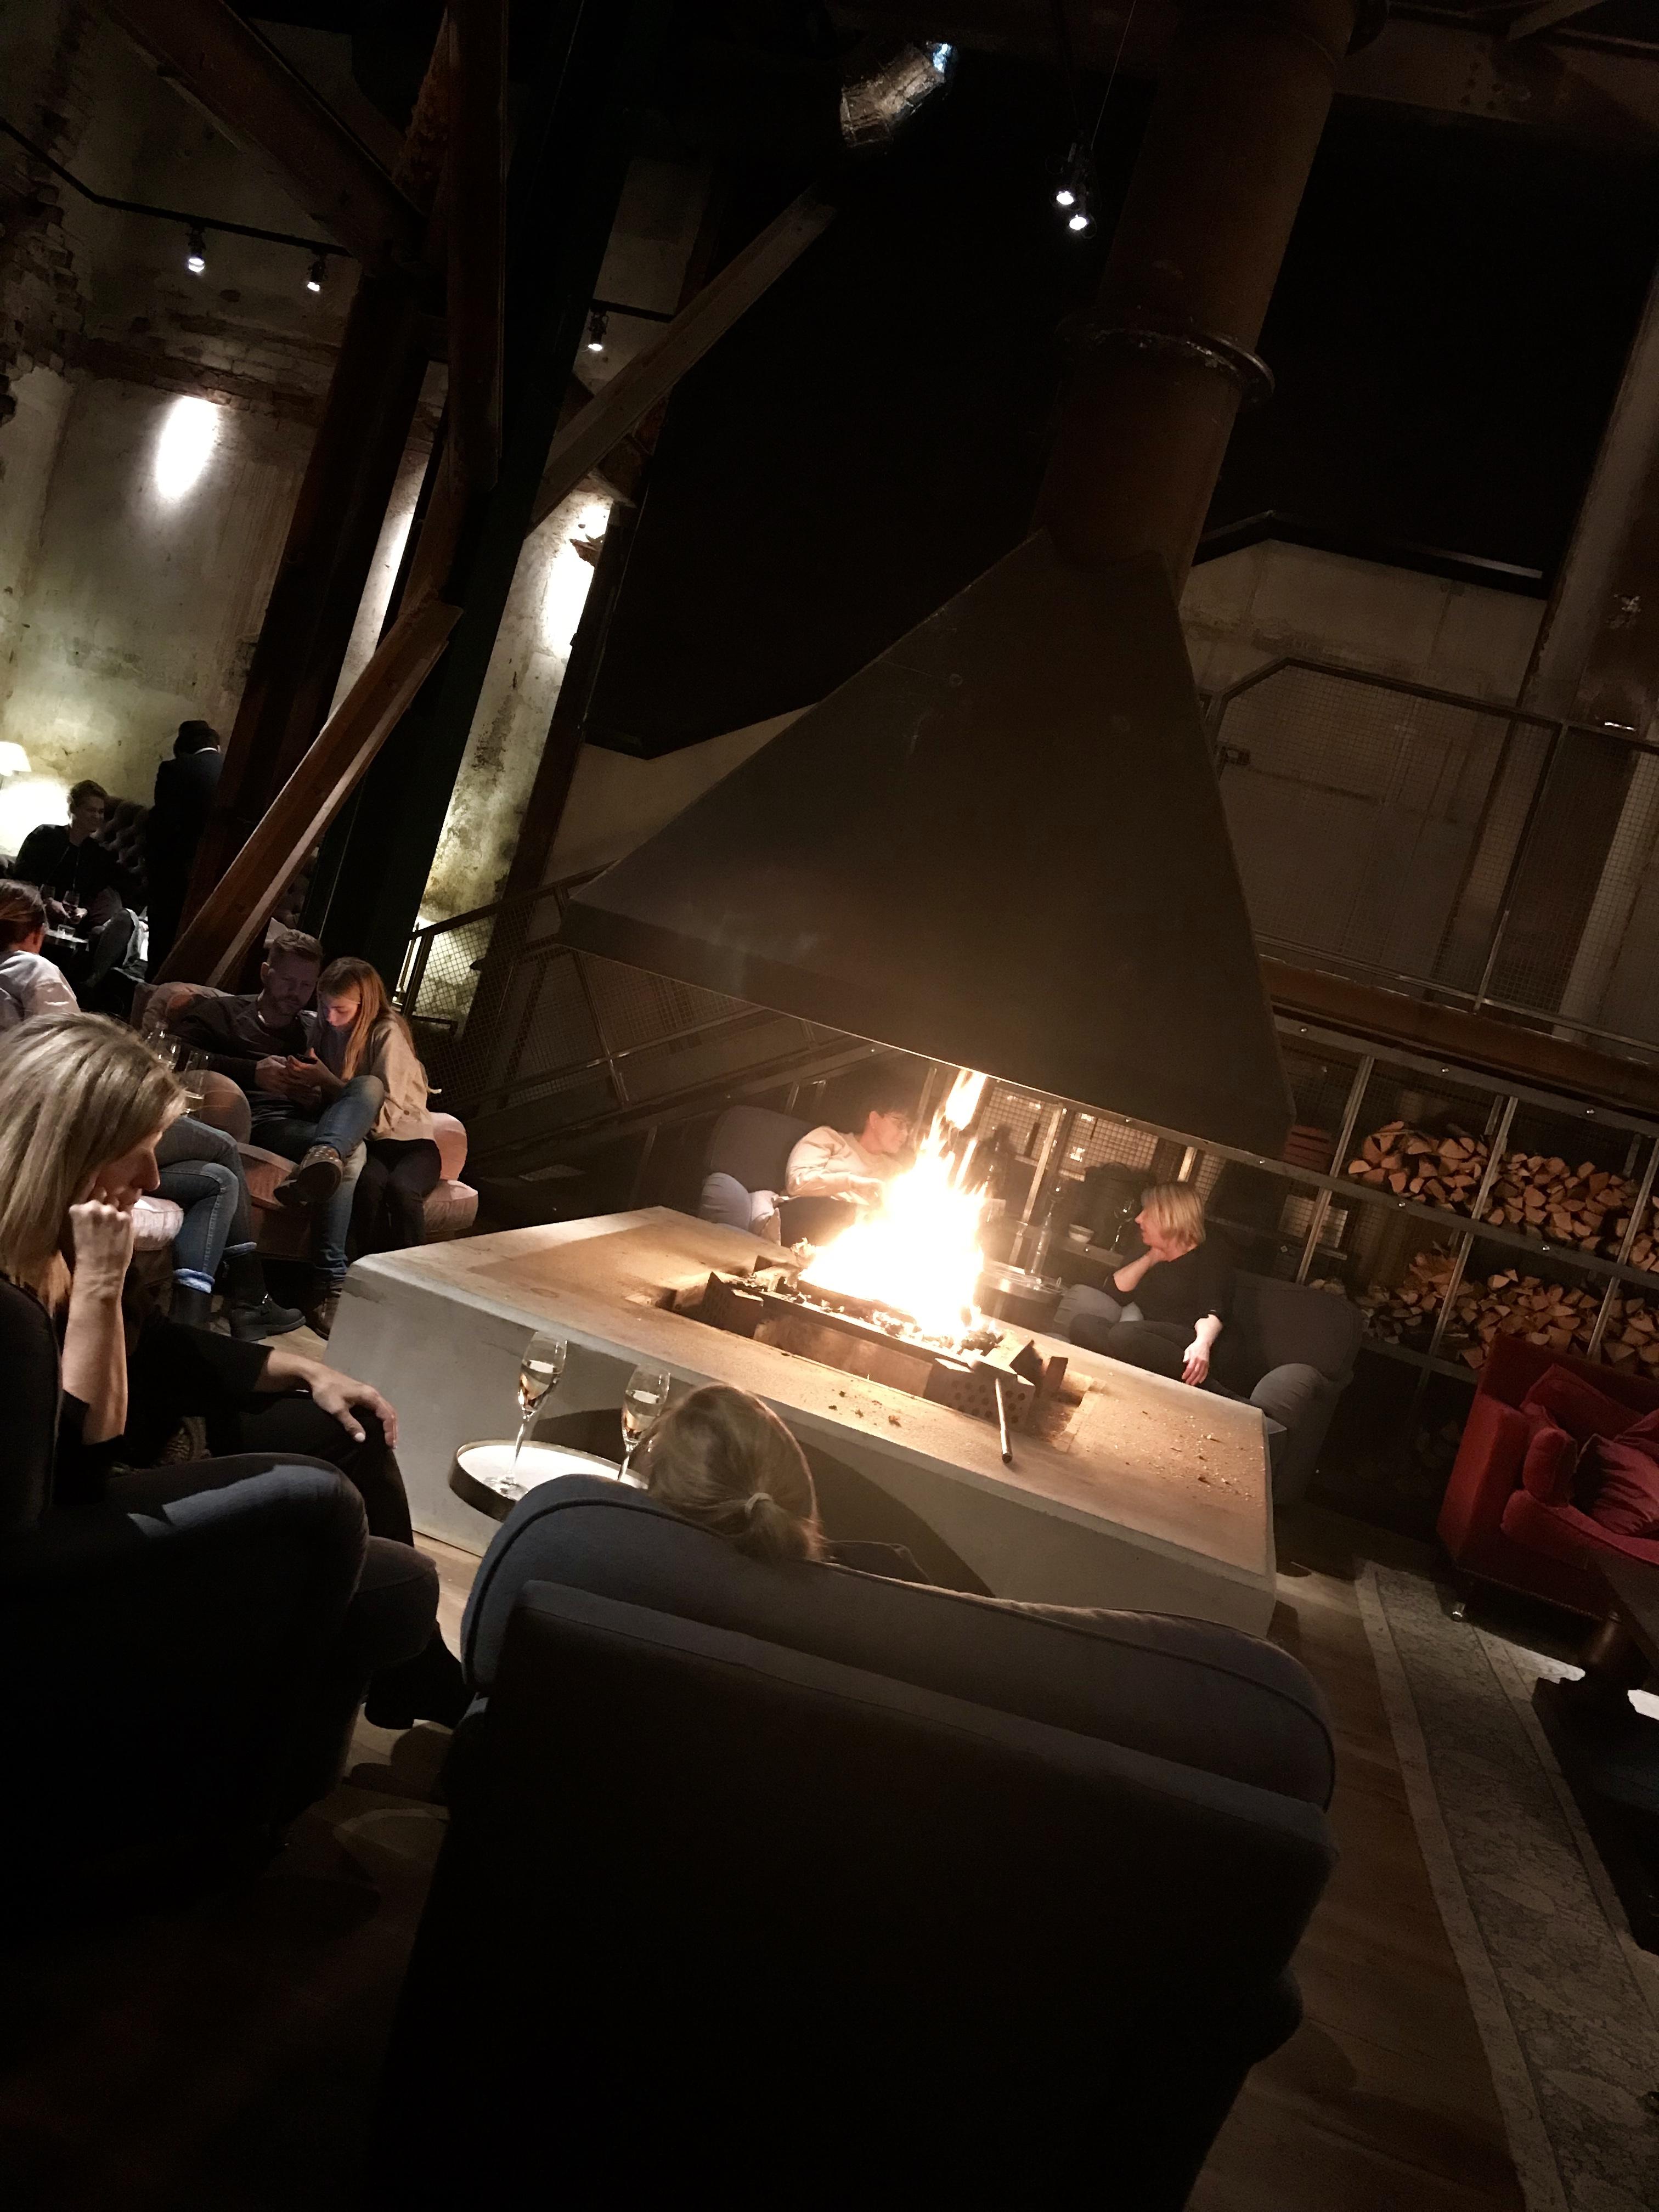 The Steam Hotel